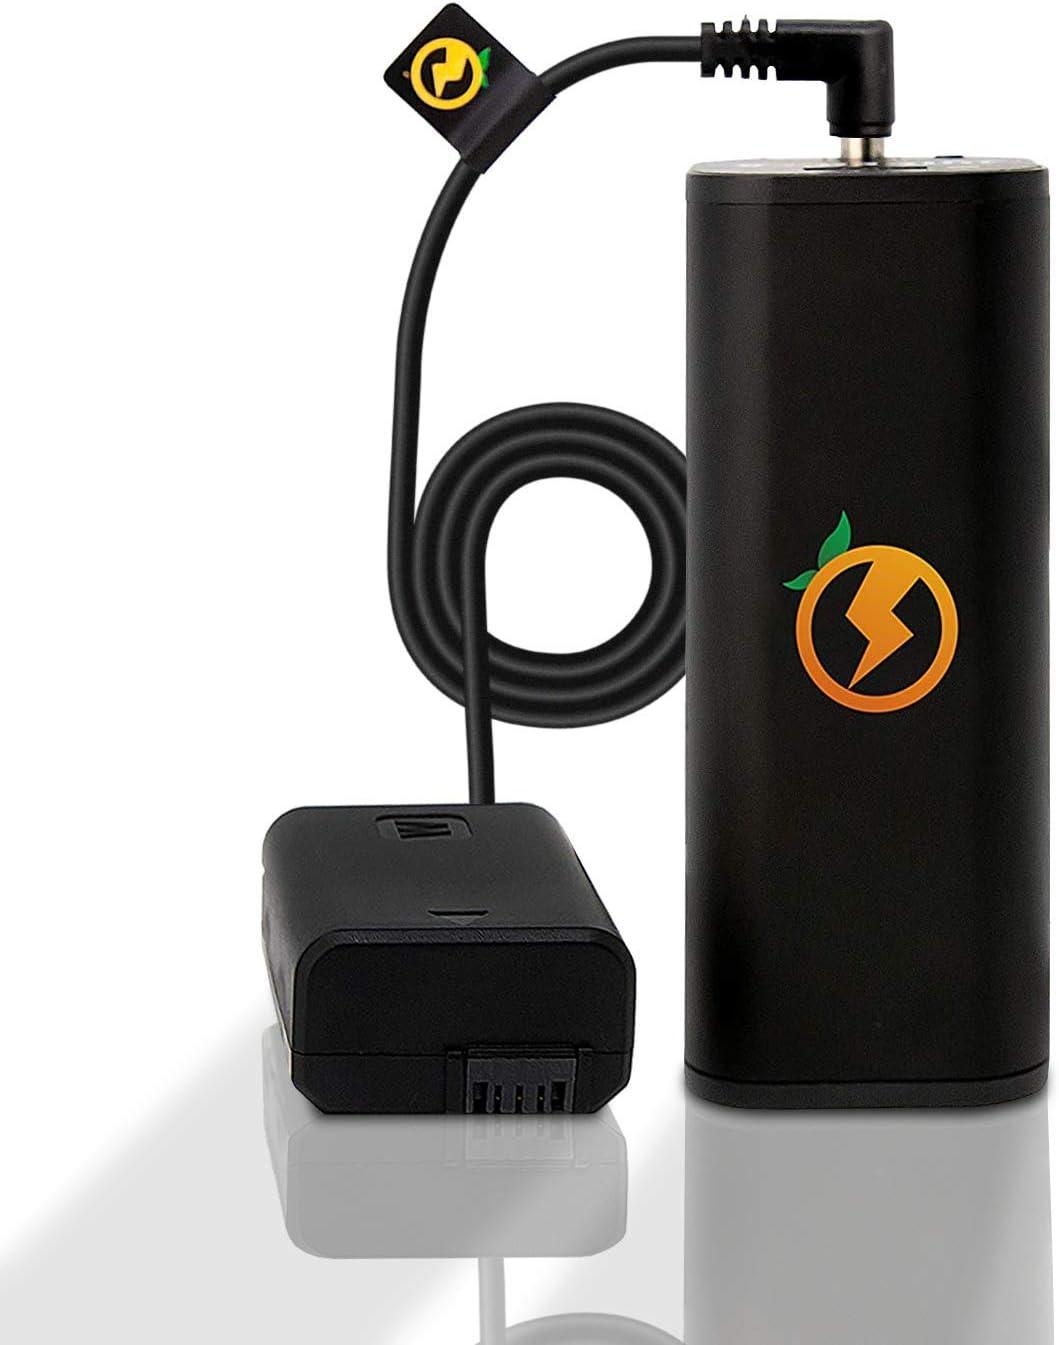 New Juicebox External Battery Kit for Max 53% OFF A7S Cameras Sony Se Nippon regular agency DSLR